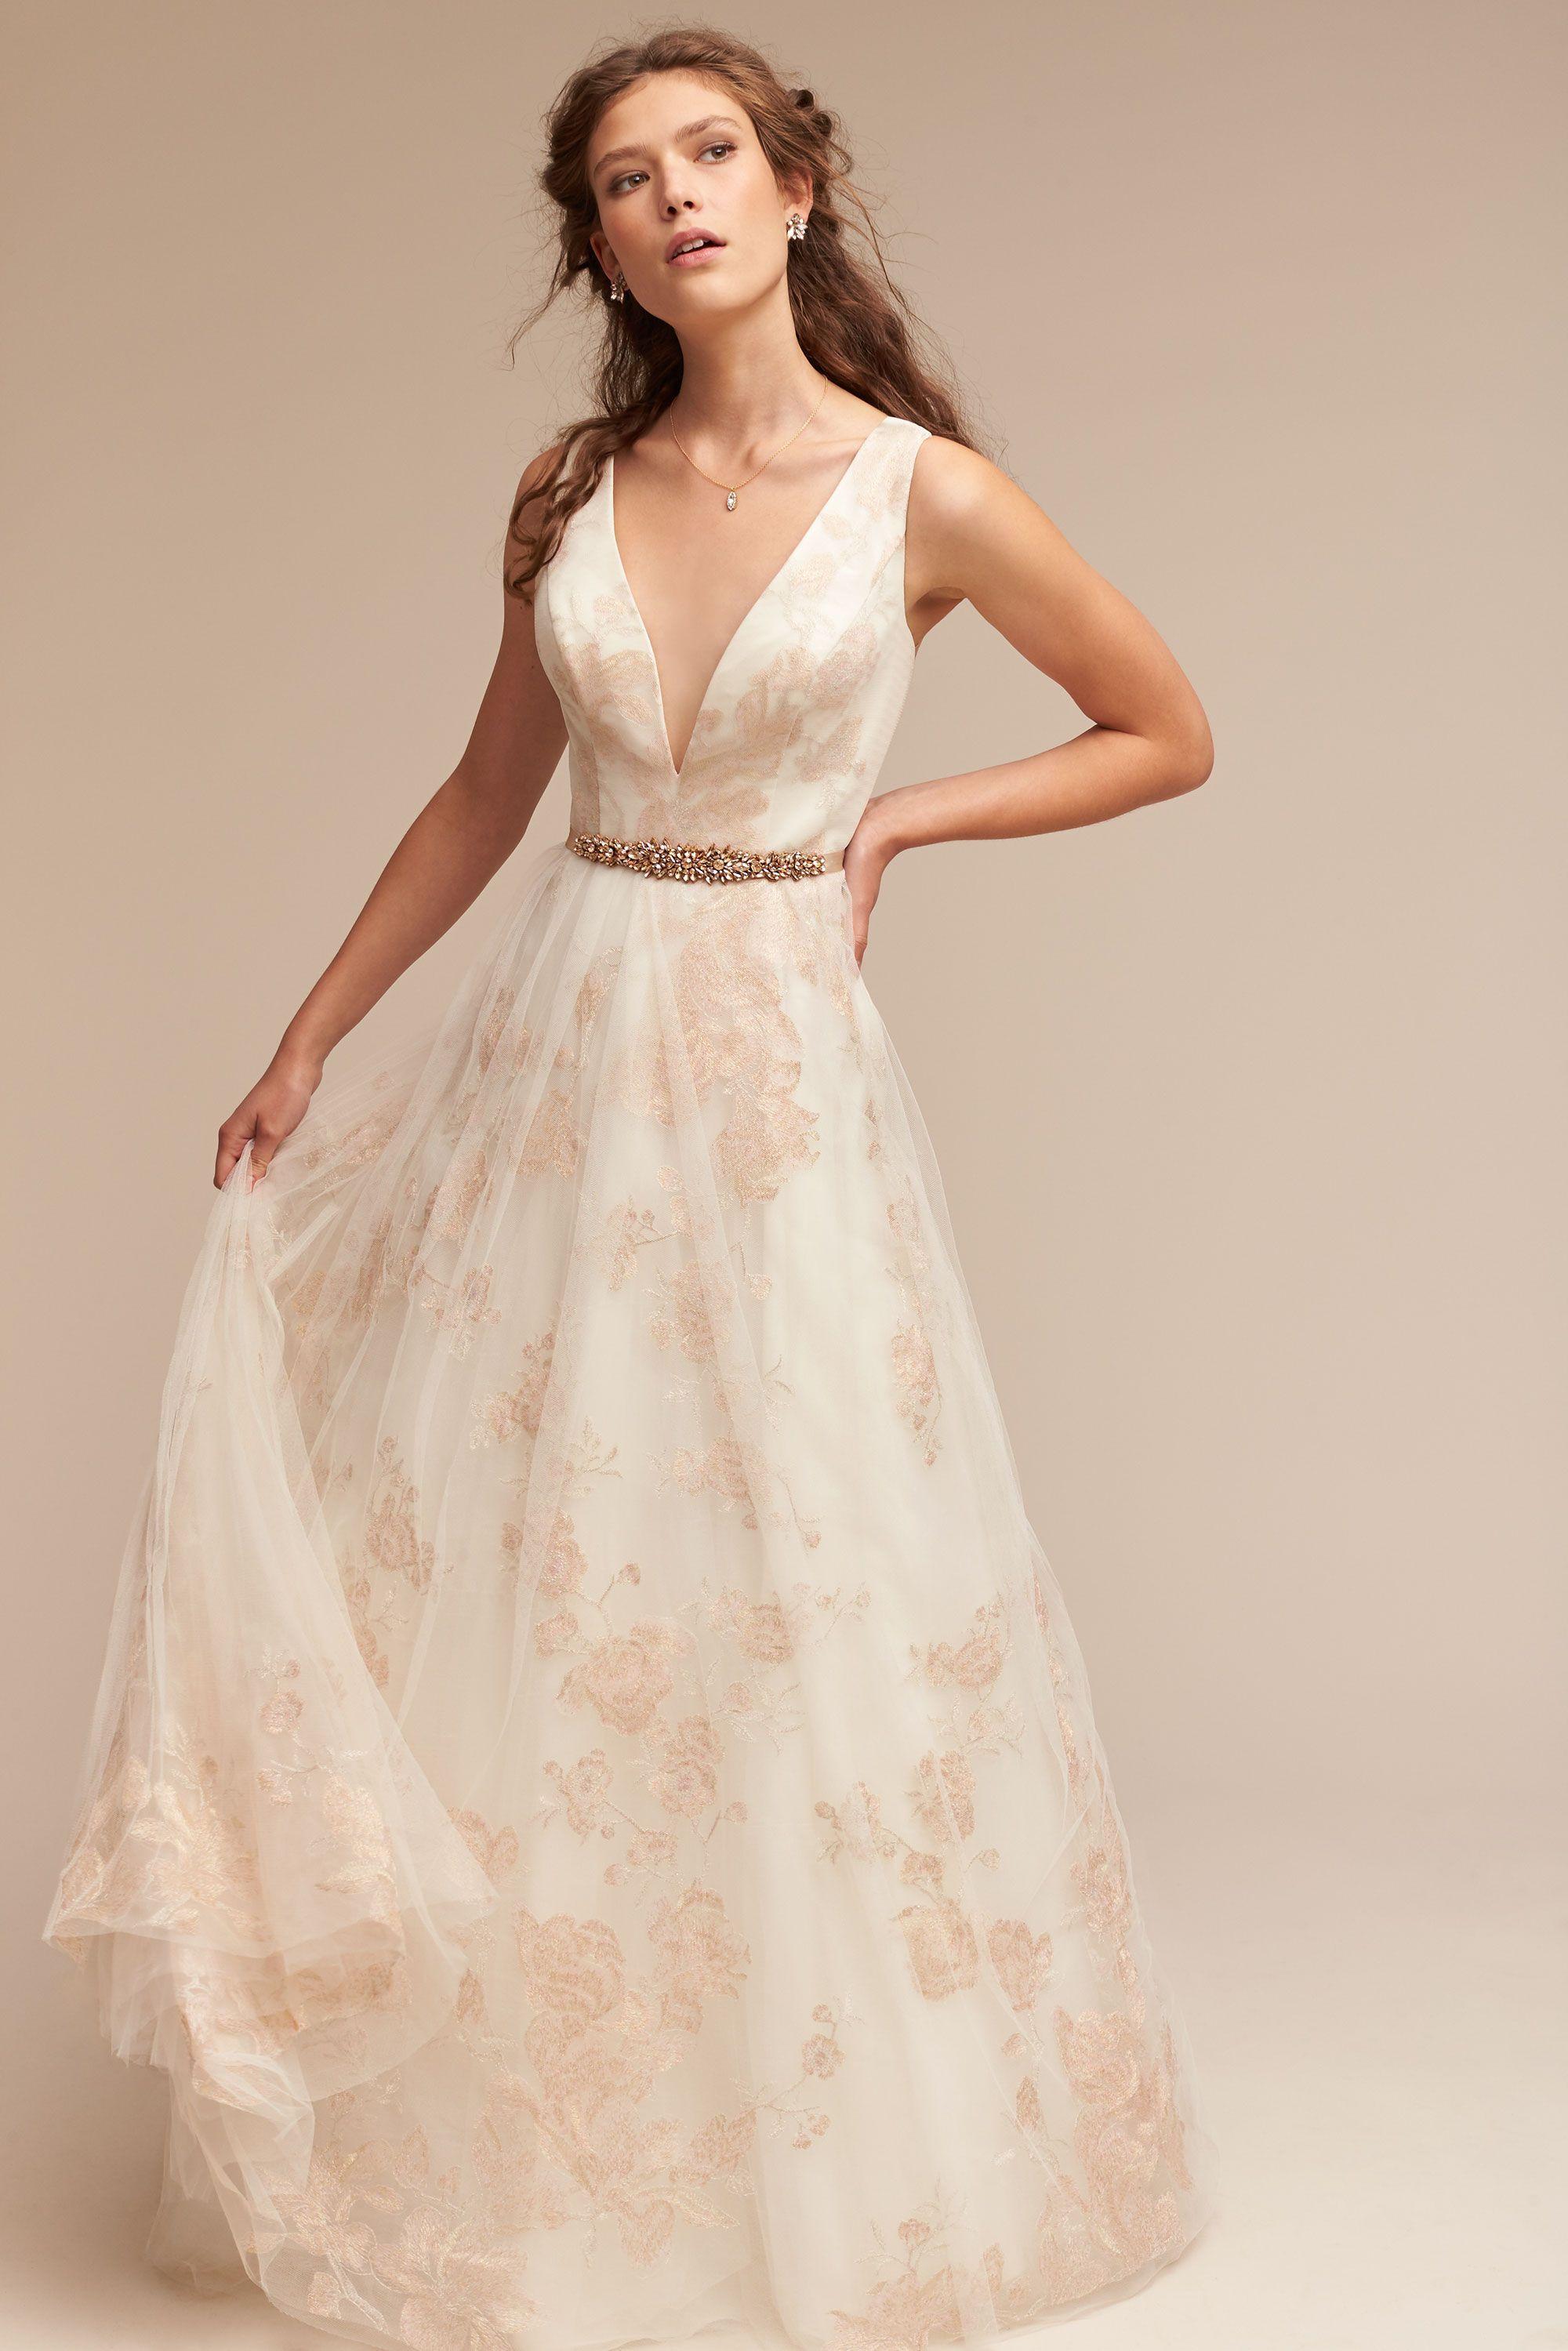 BHLDN Lily Gown in Bride Wedding Dresses | BHLDN | VESTIDOS DE ...